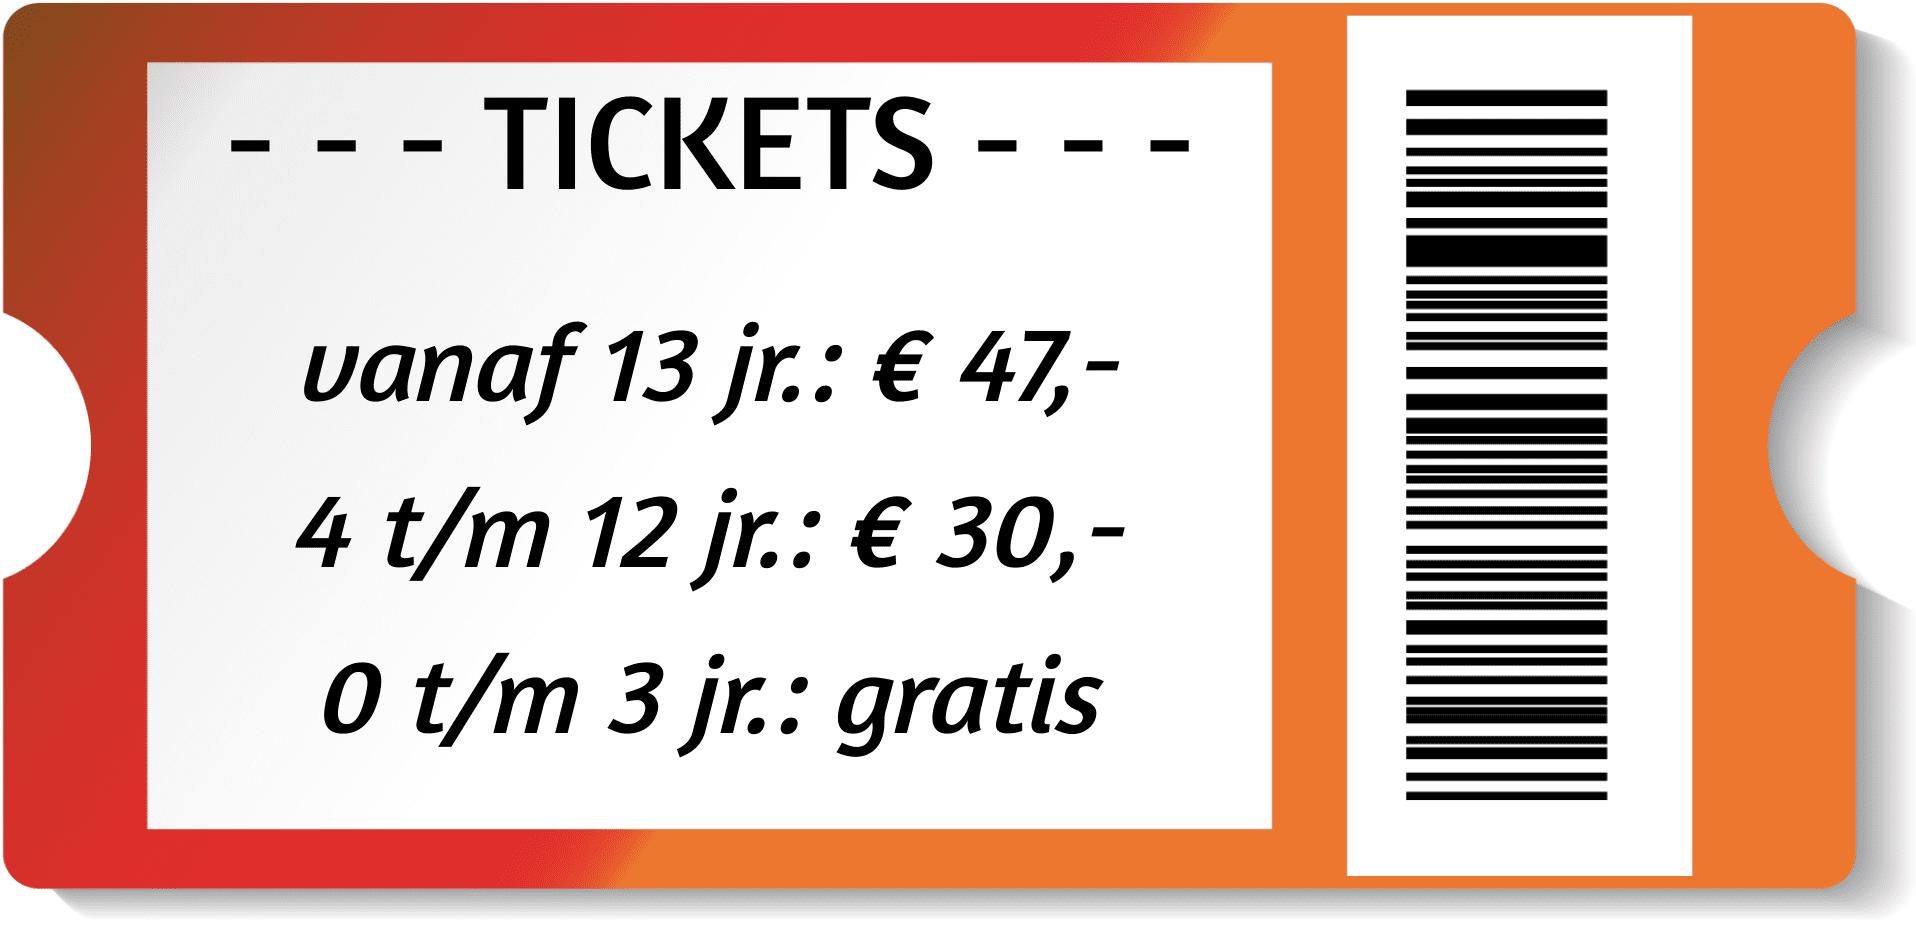 bustour curacao tickets